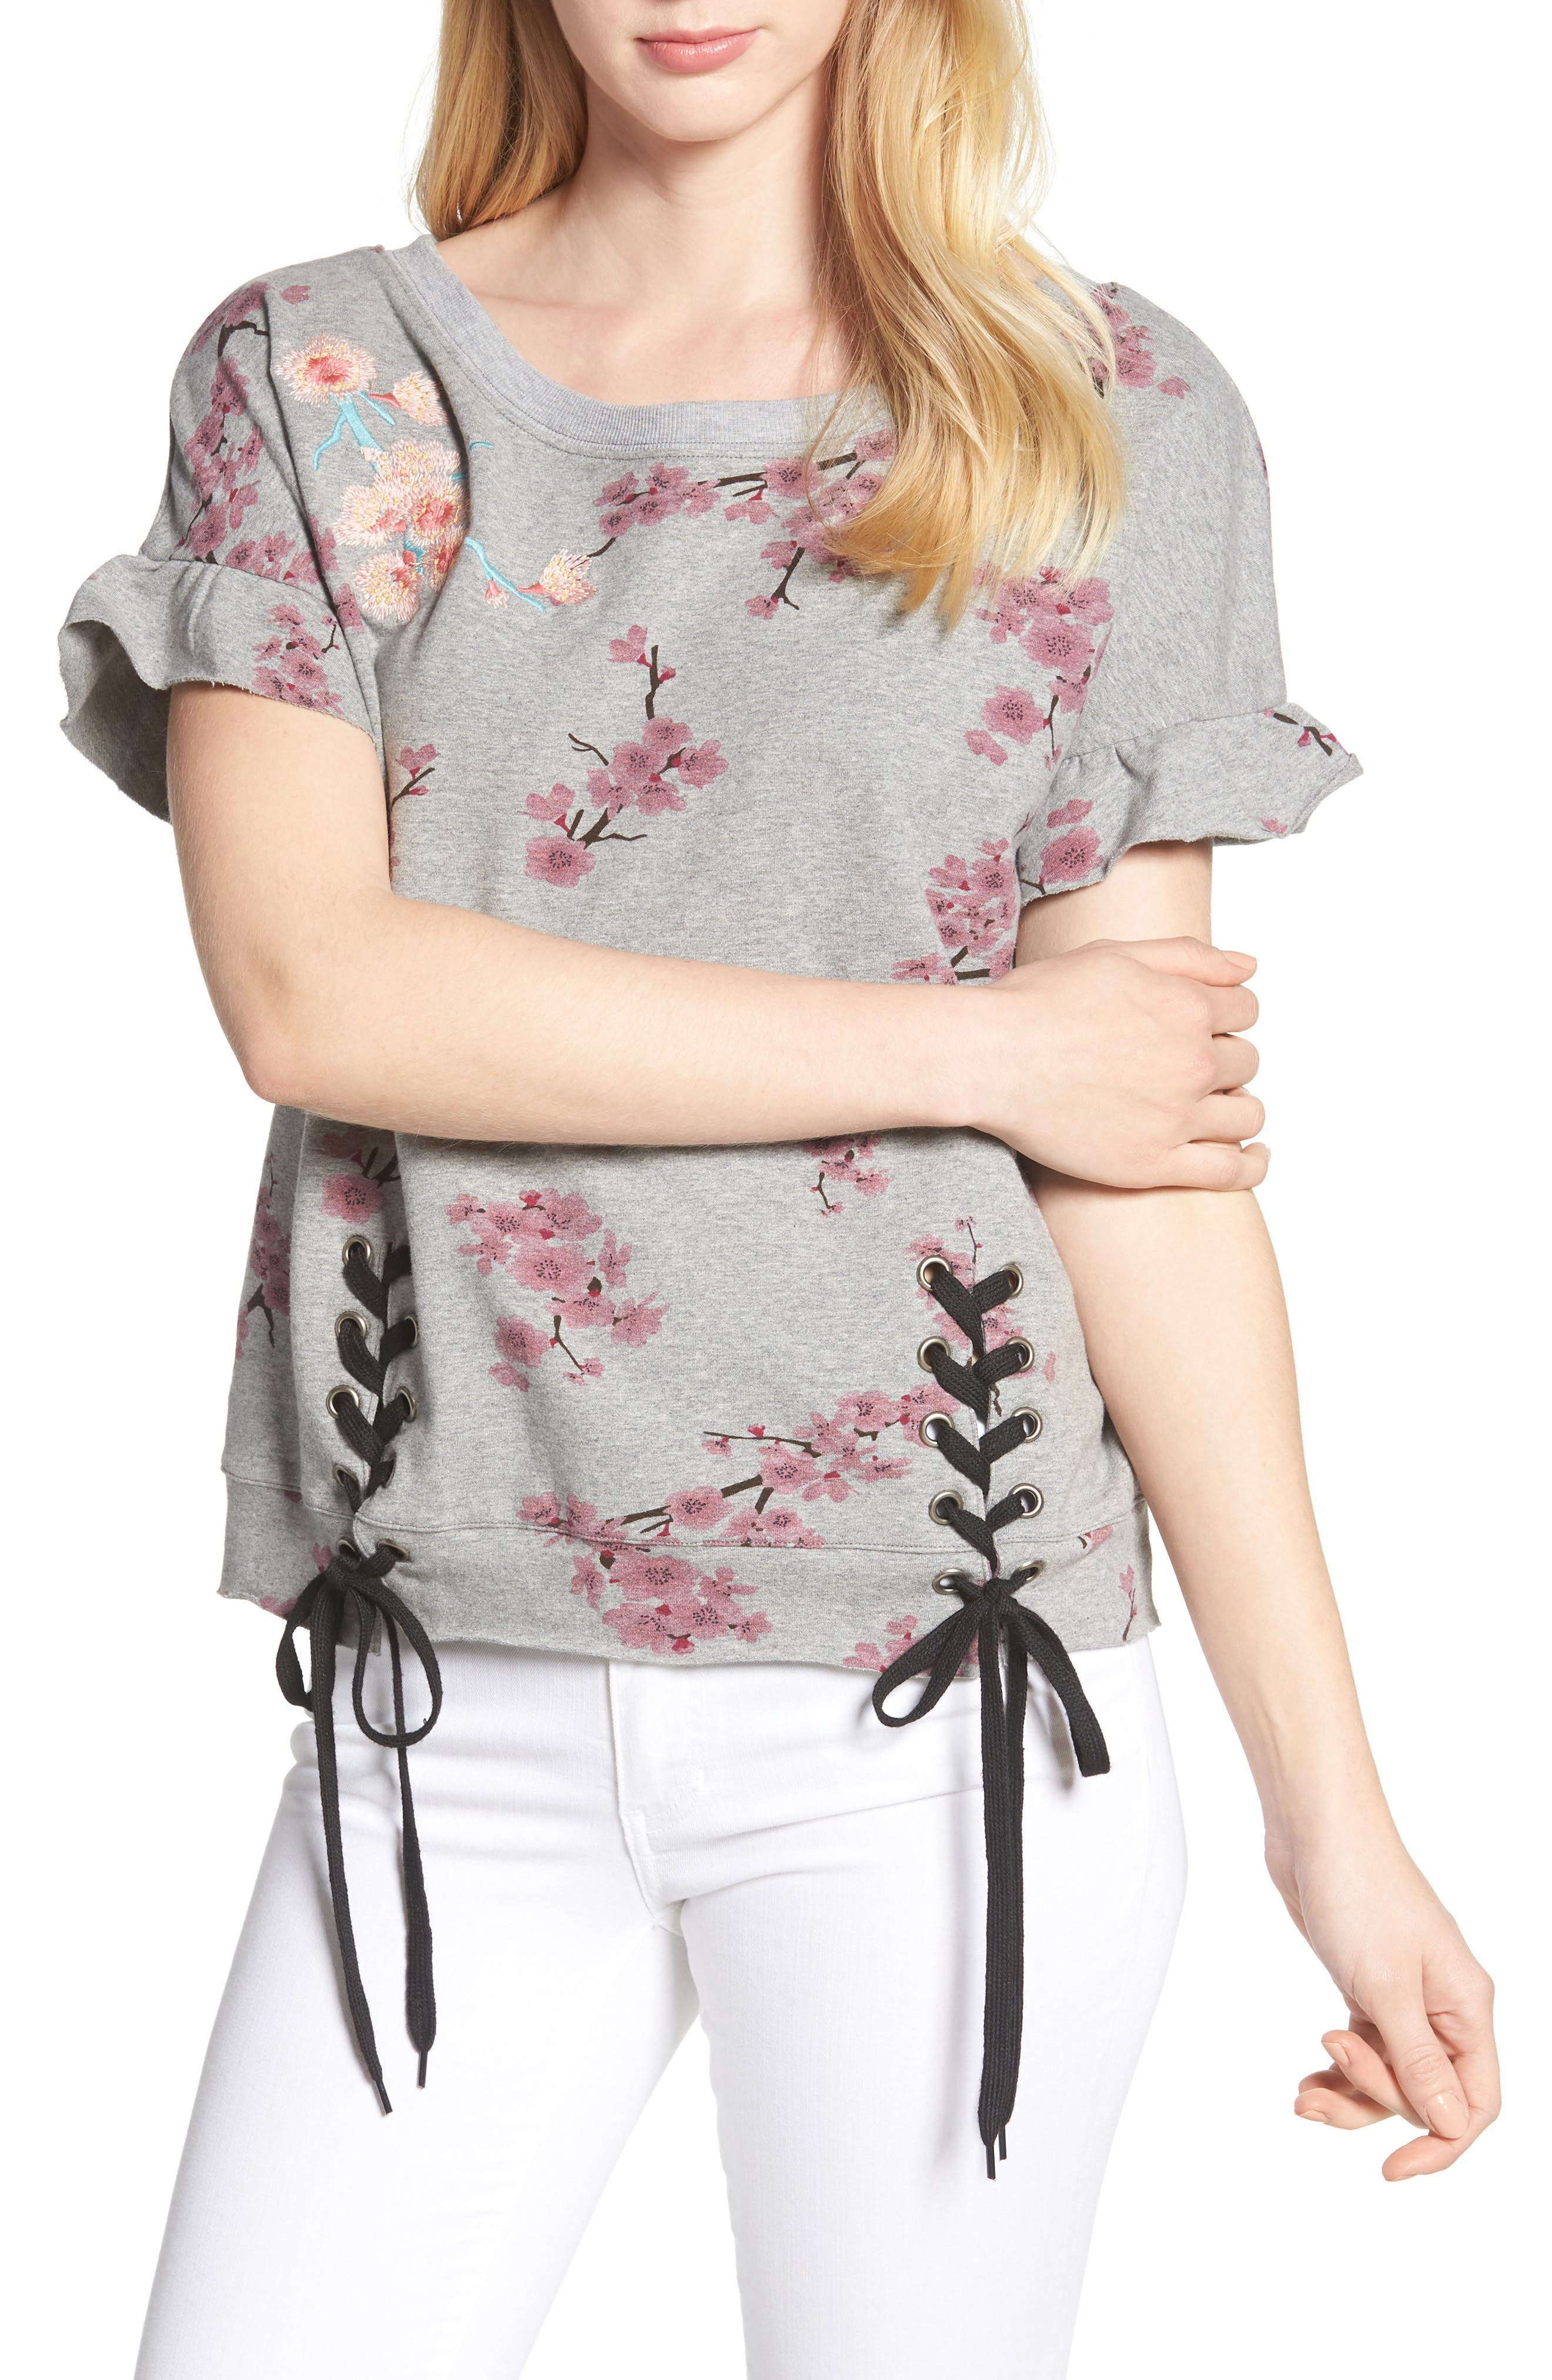 Short Sleeve Lace Up Cherry Blossom Sweatshirt,                             Main thumbnail 1, color,                             020